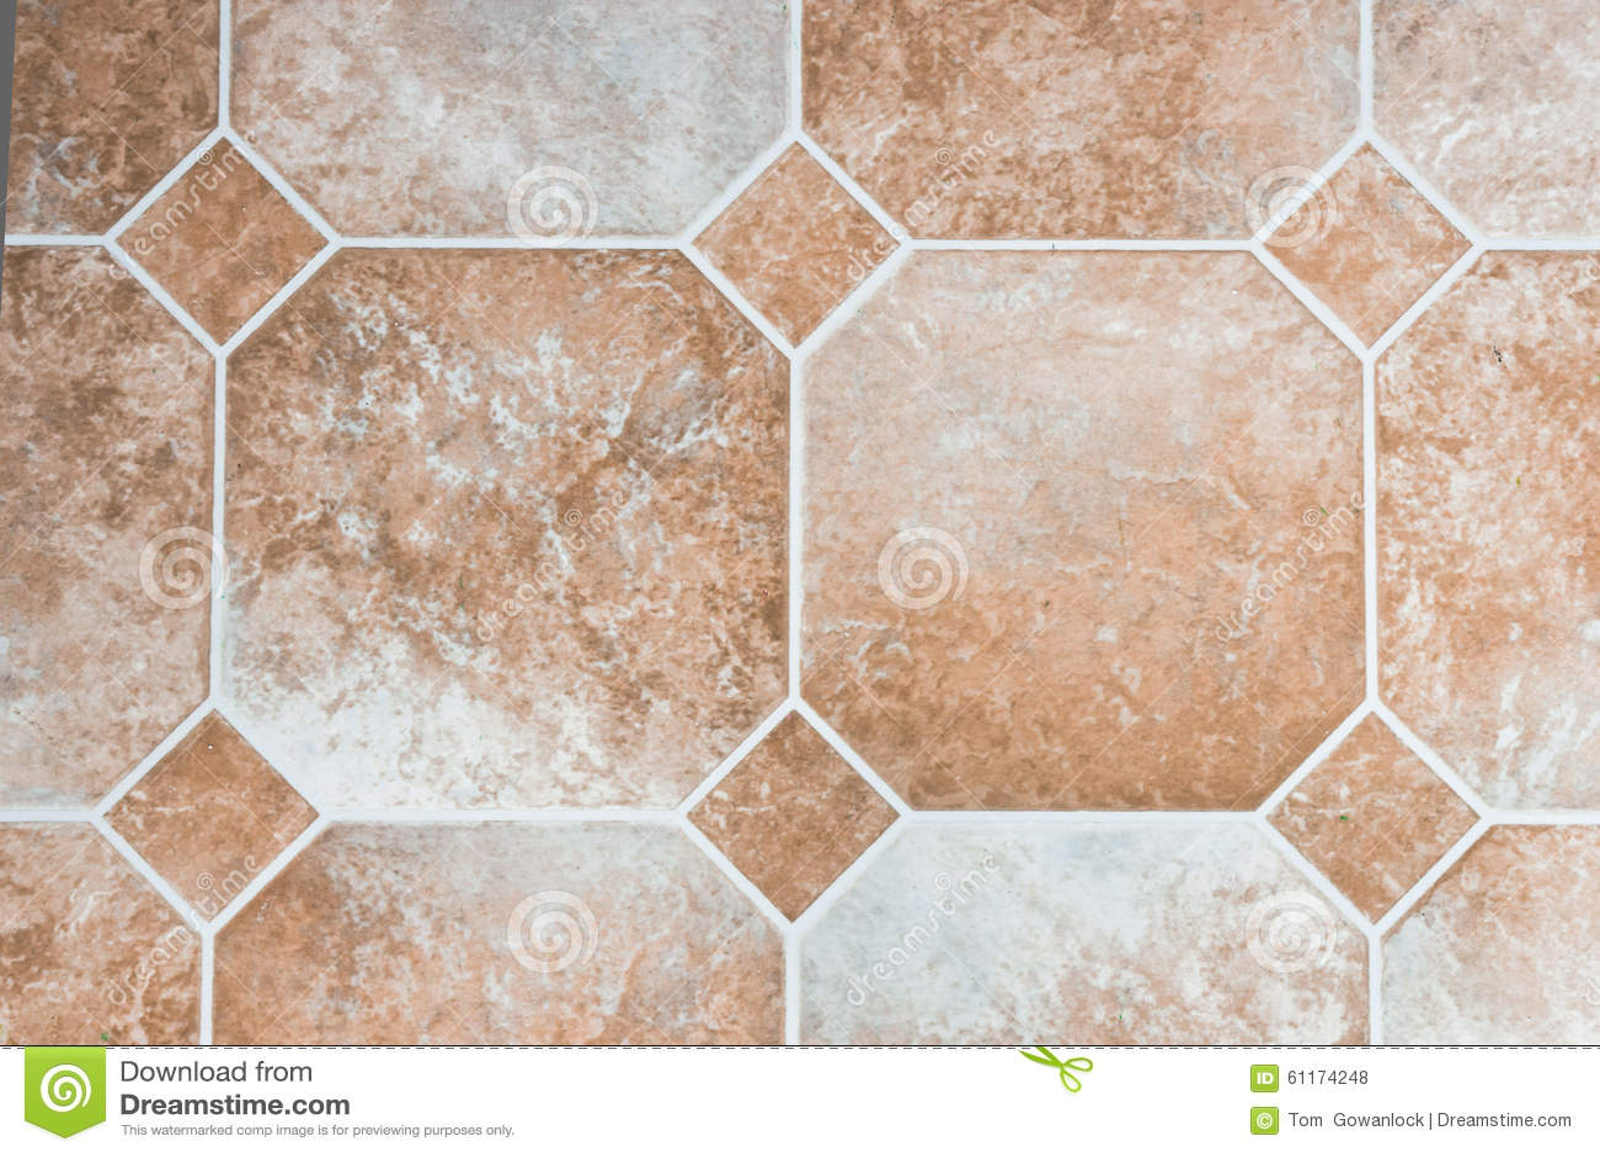 kitchen vinyl flooring navy rug 乙烯基瓦片库存照片 图片包括有靠山 瓦片 装饰 现代 正方形 browne 乙烯基瓦片